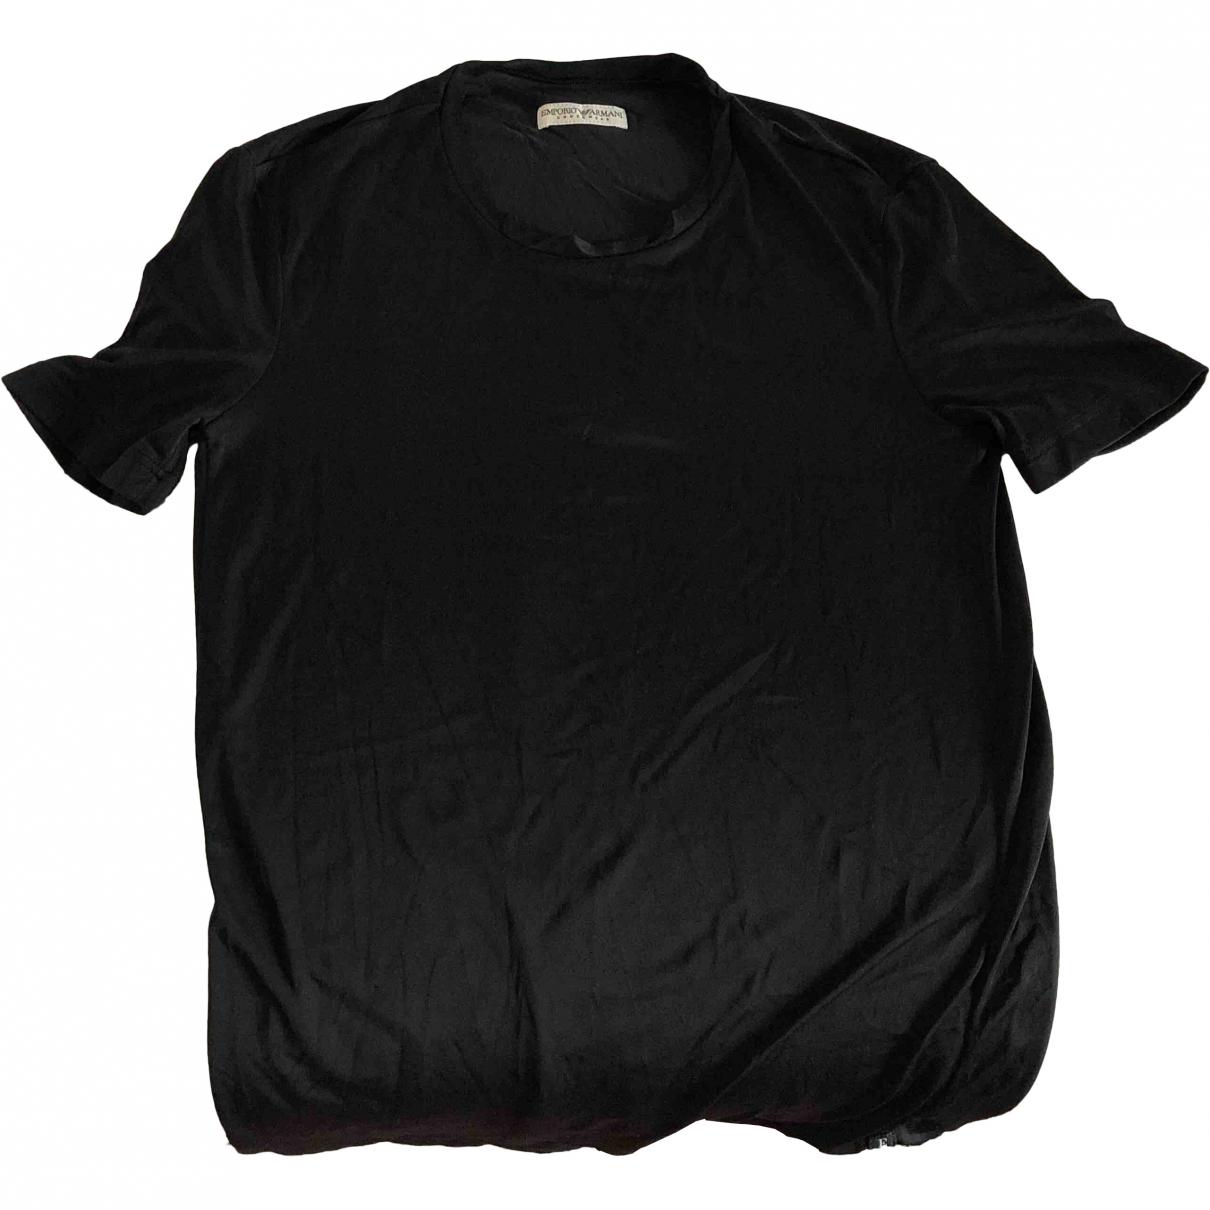 Emporio Armani \N Black T-shirts for Men S International